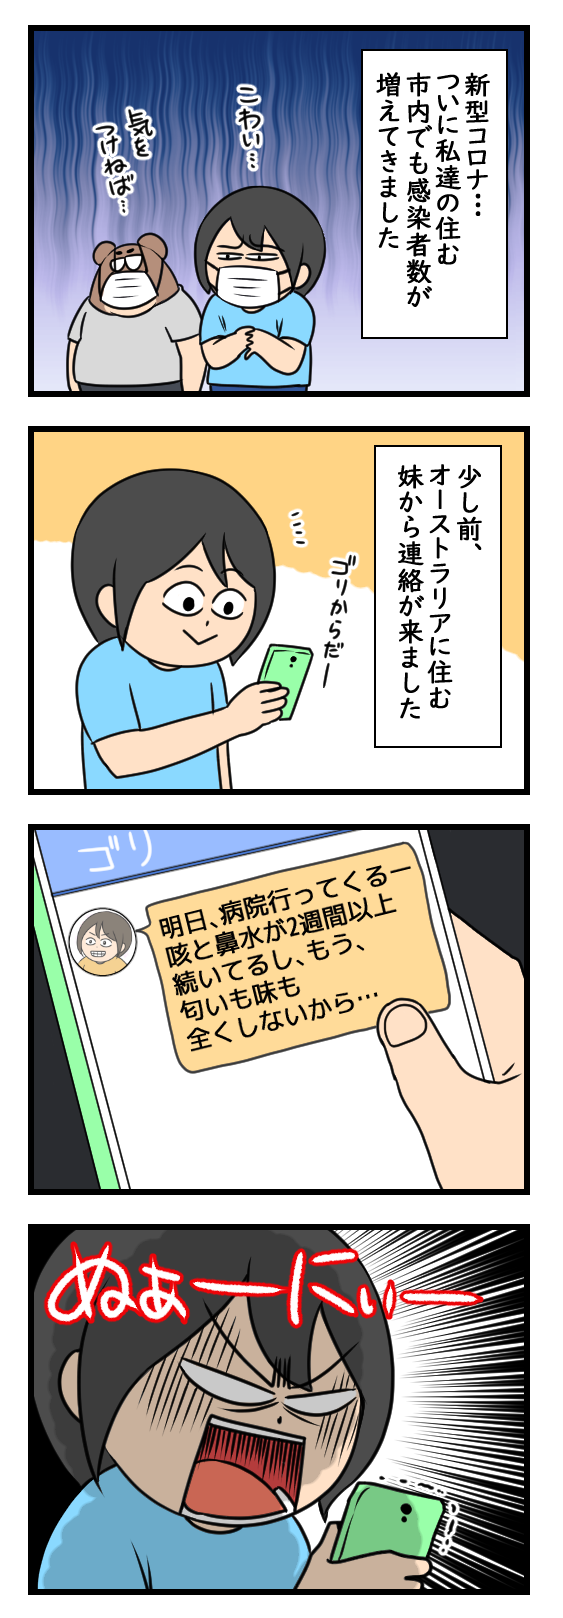 019_1